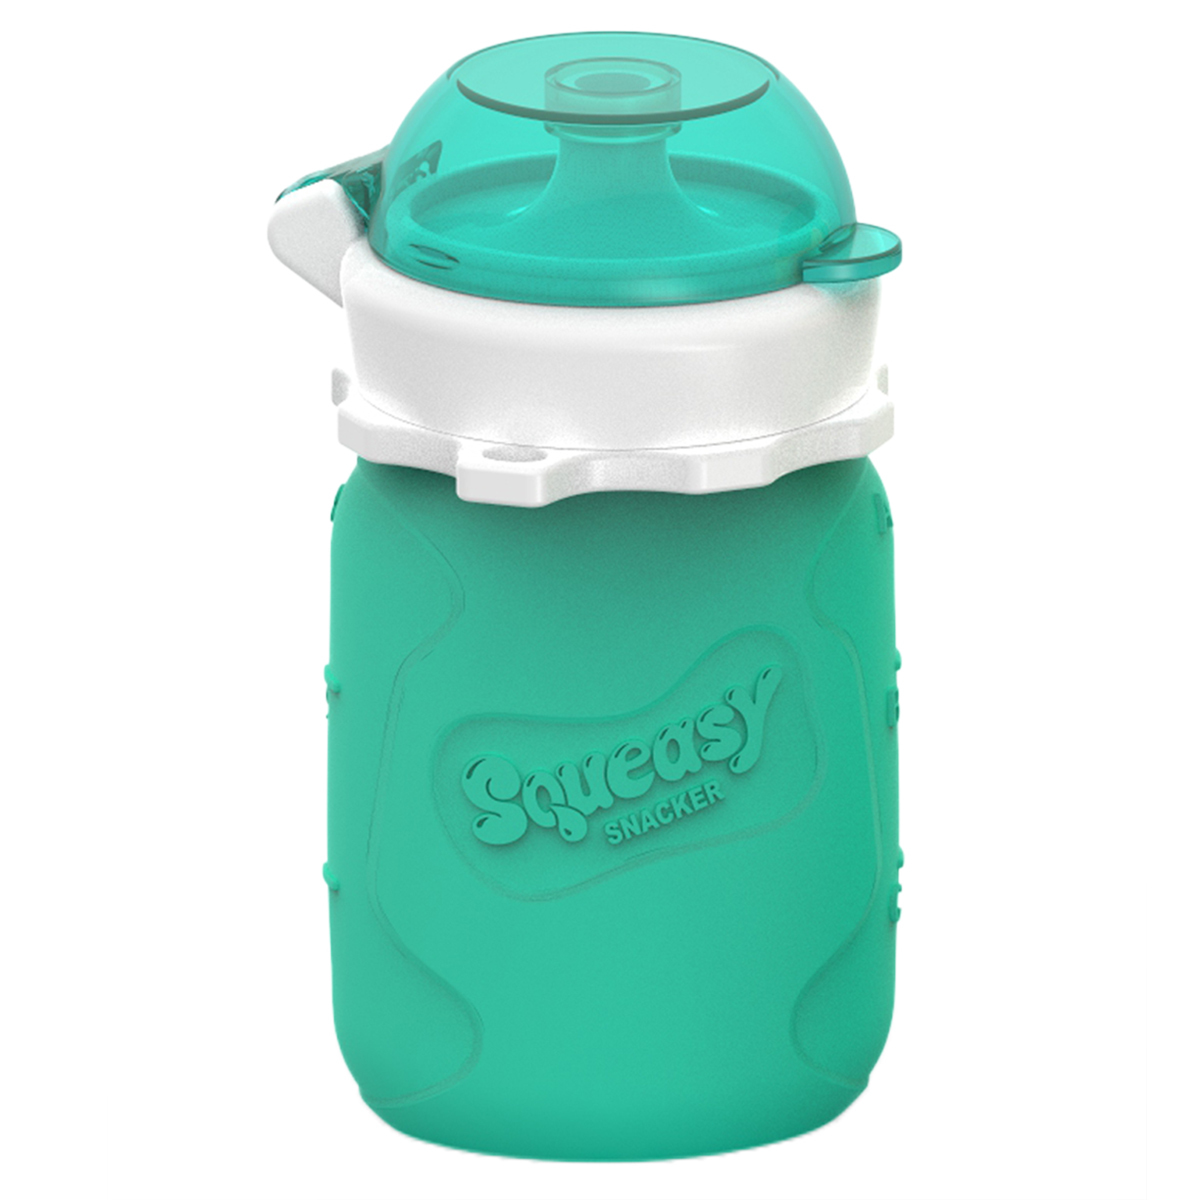 Squeasy Gear Snacker - Aqua Blue (104ml) image